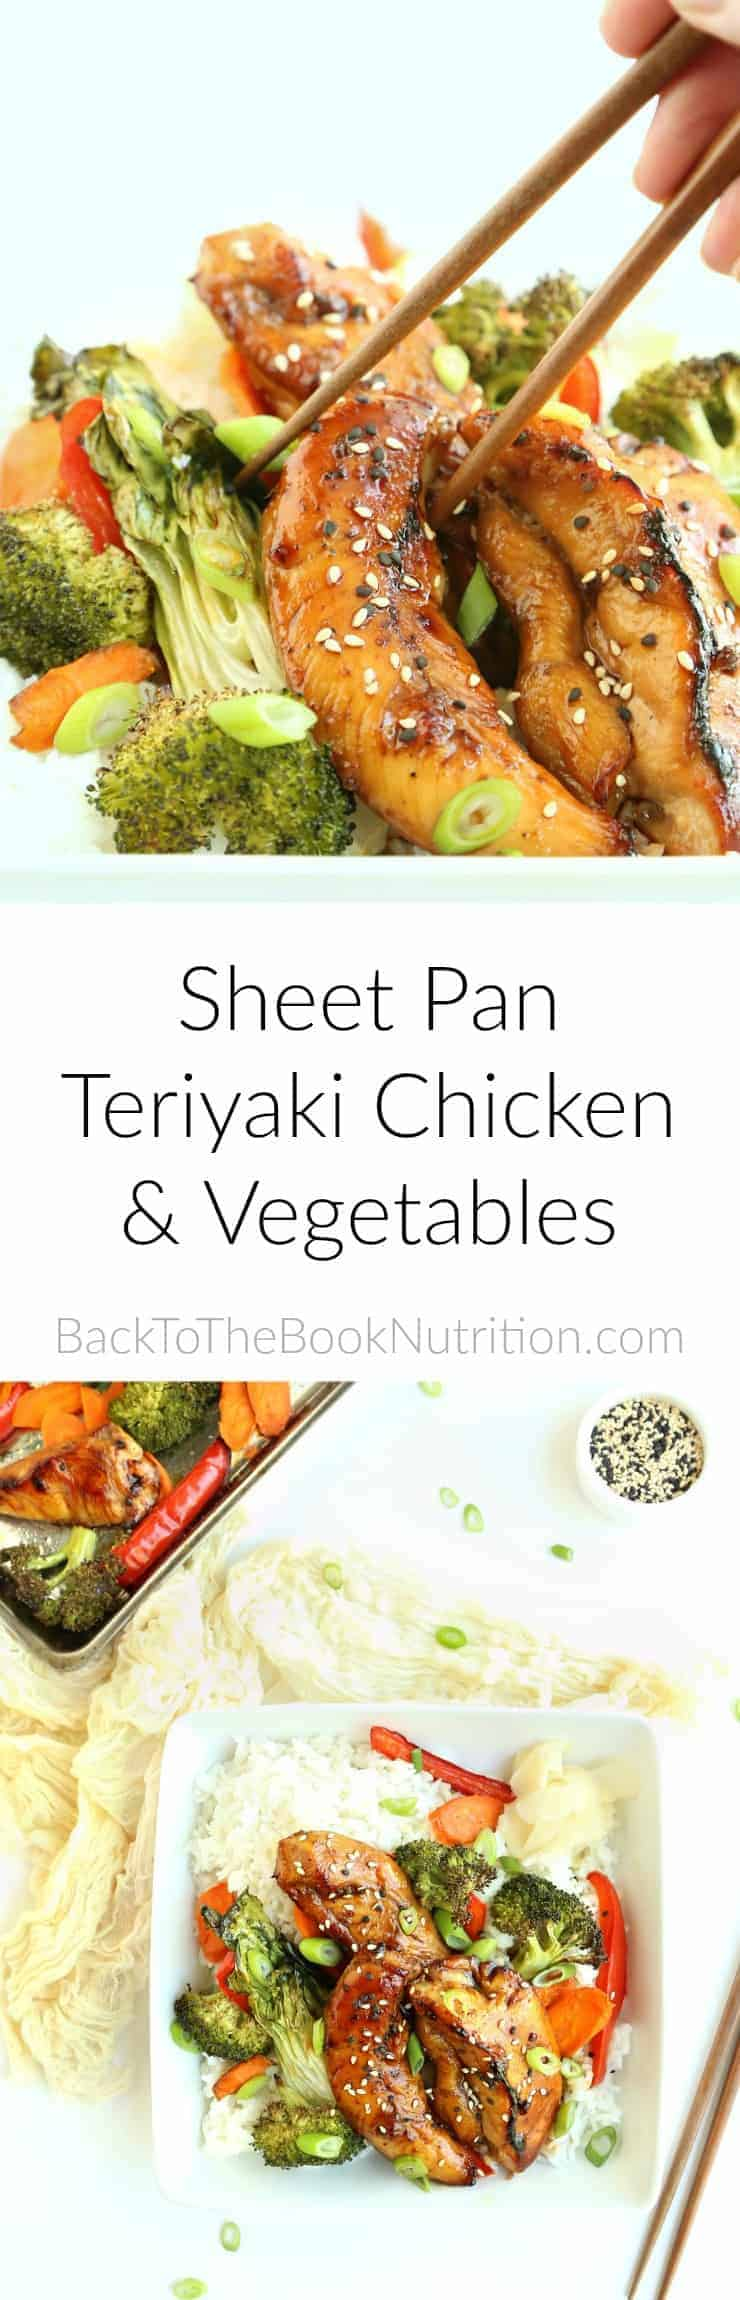 Gluten free sheet pan teriyaki chicken and vegetables